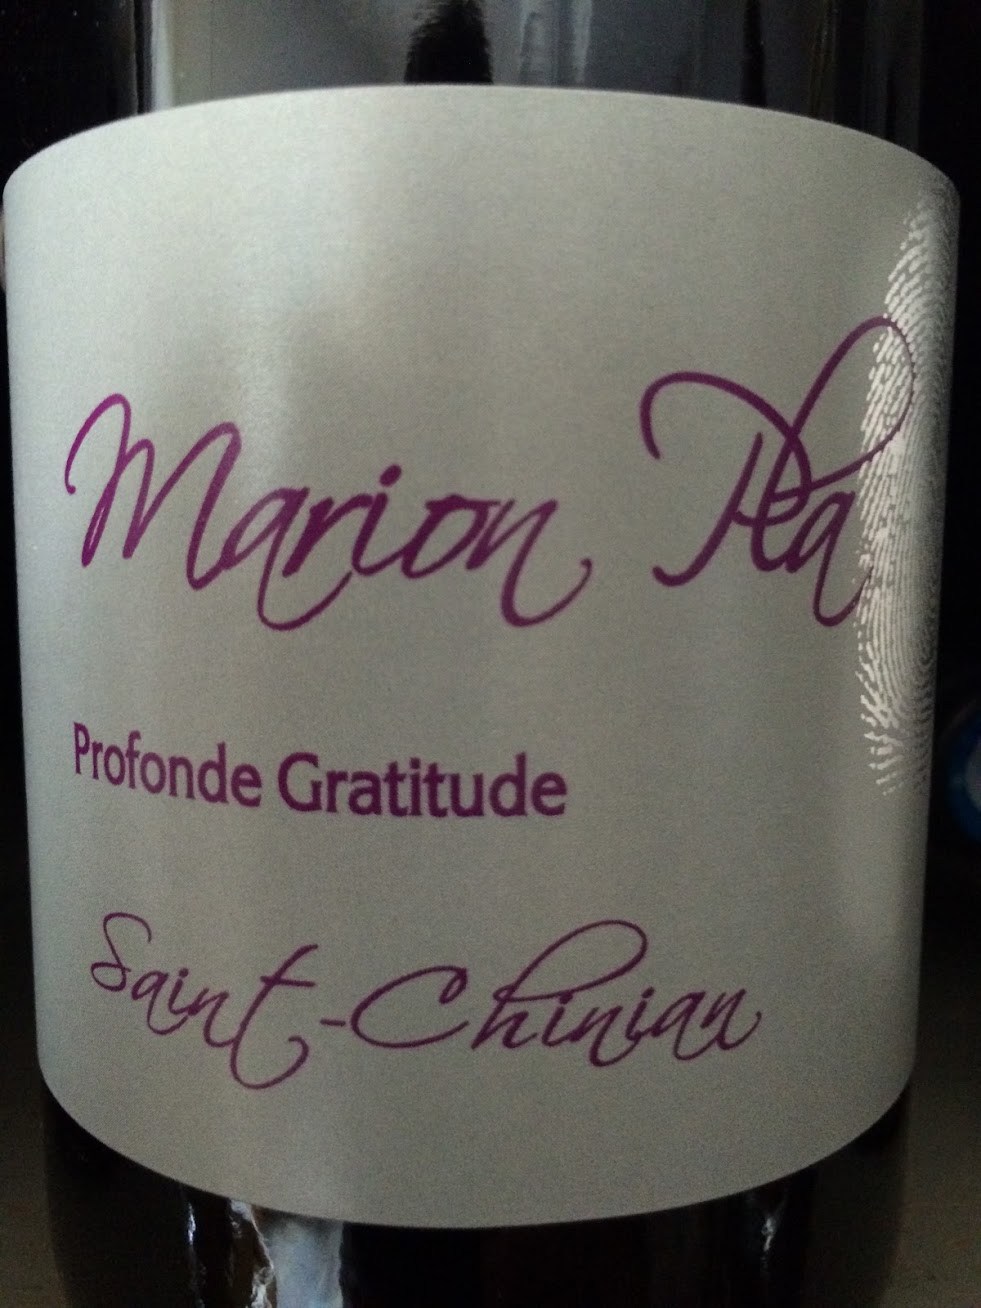 Profonde Gratitude - Rouge - 2014